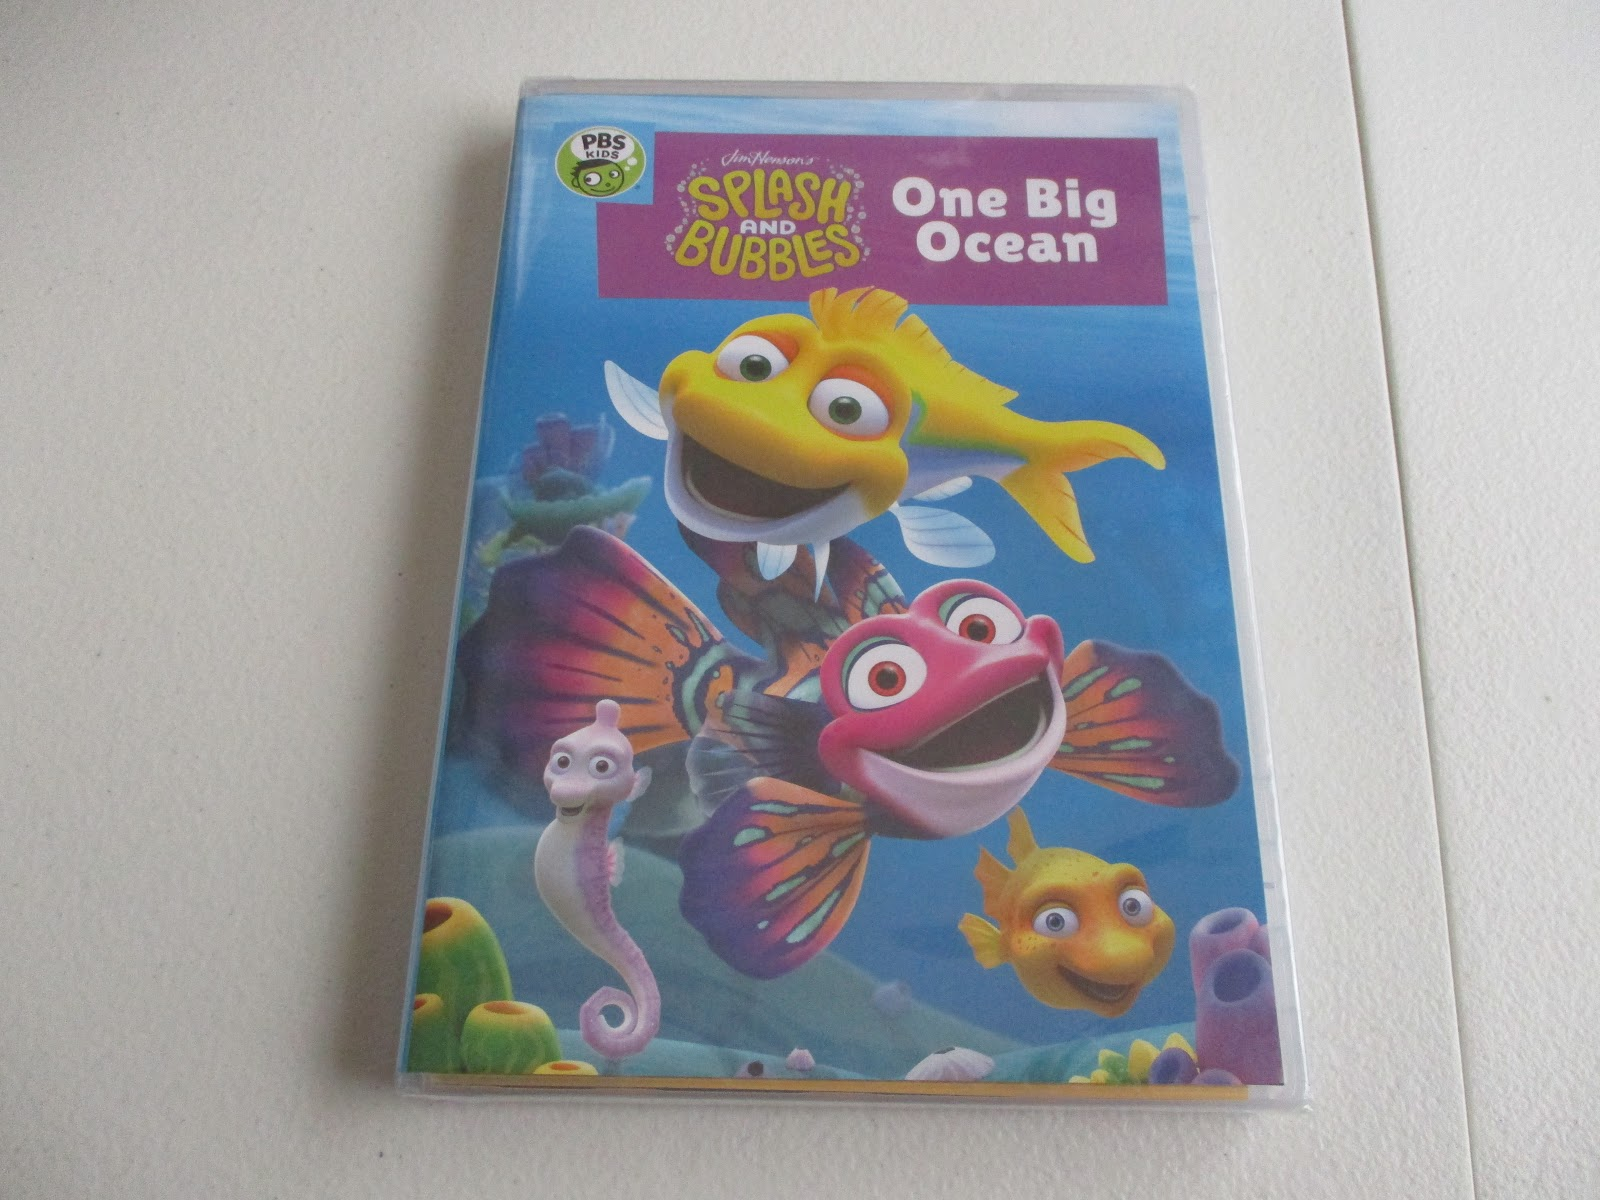 splash and bubbles one big ocean dvd